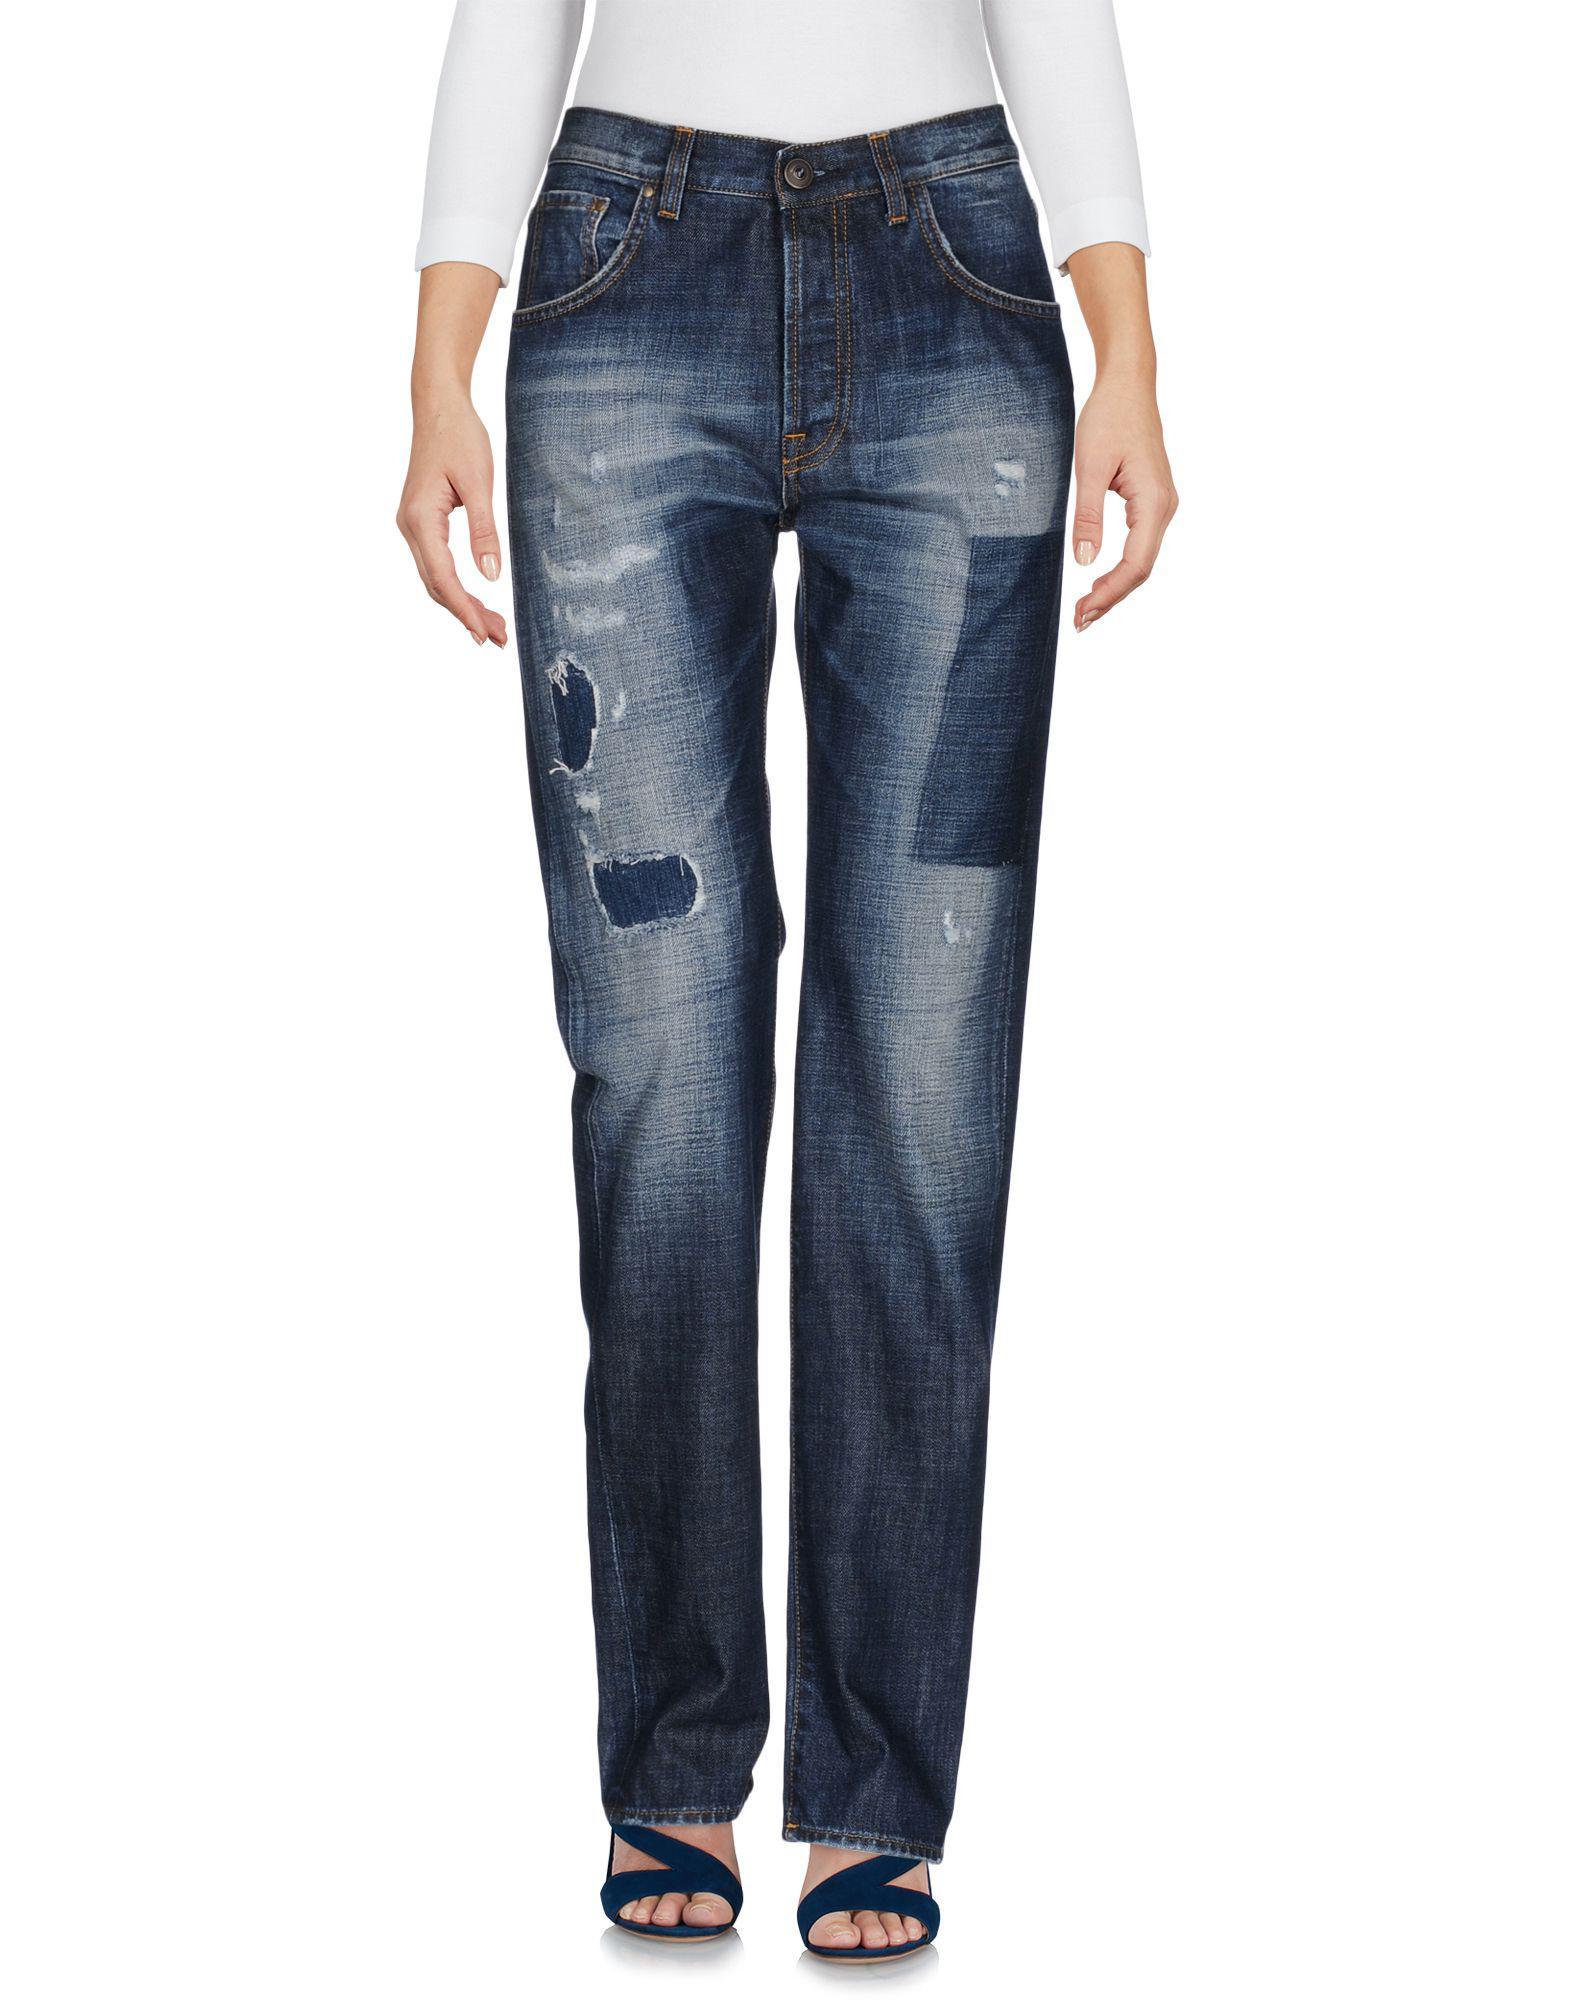 DENIM - Denim trousers Aglini Discount Prices i2TOLW6VW